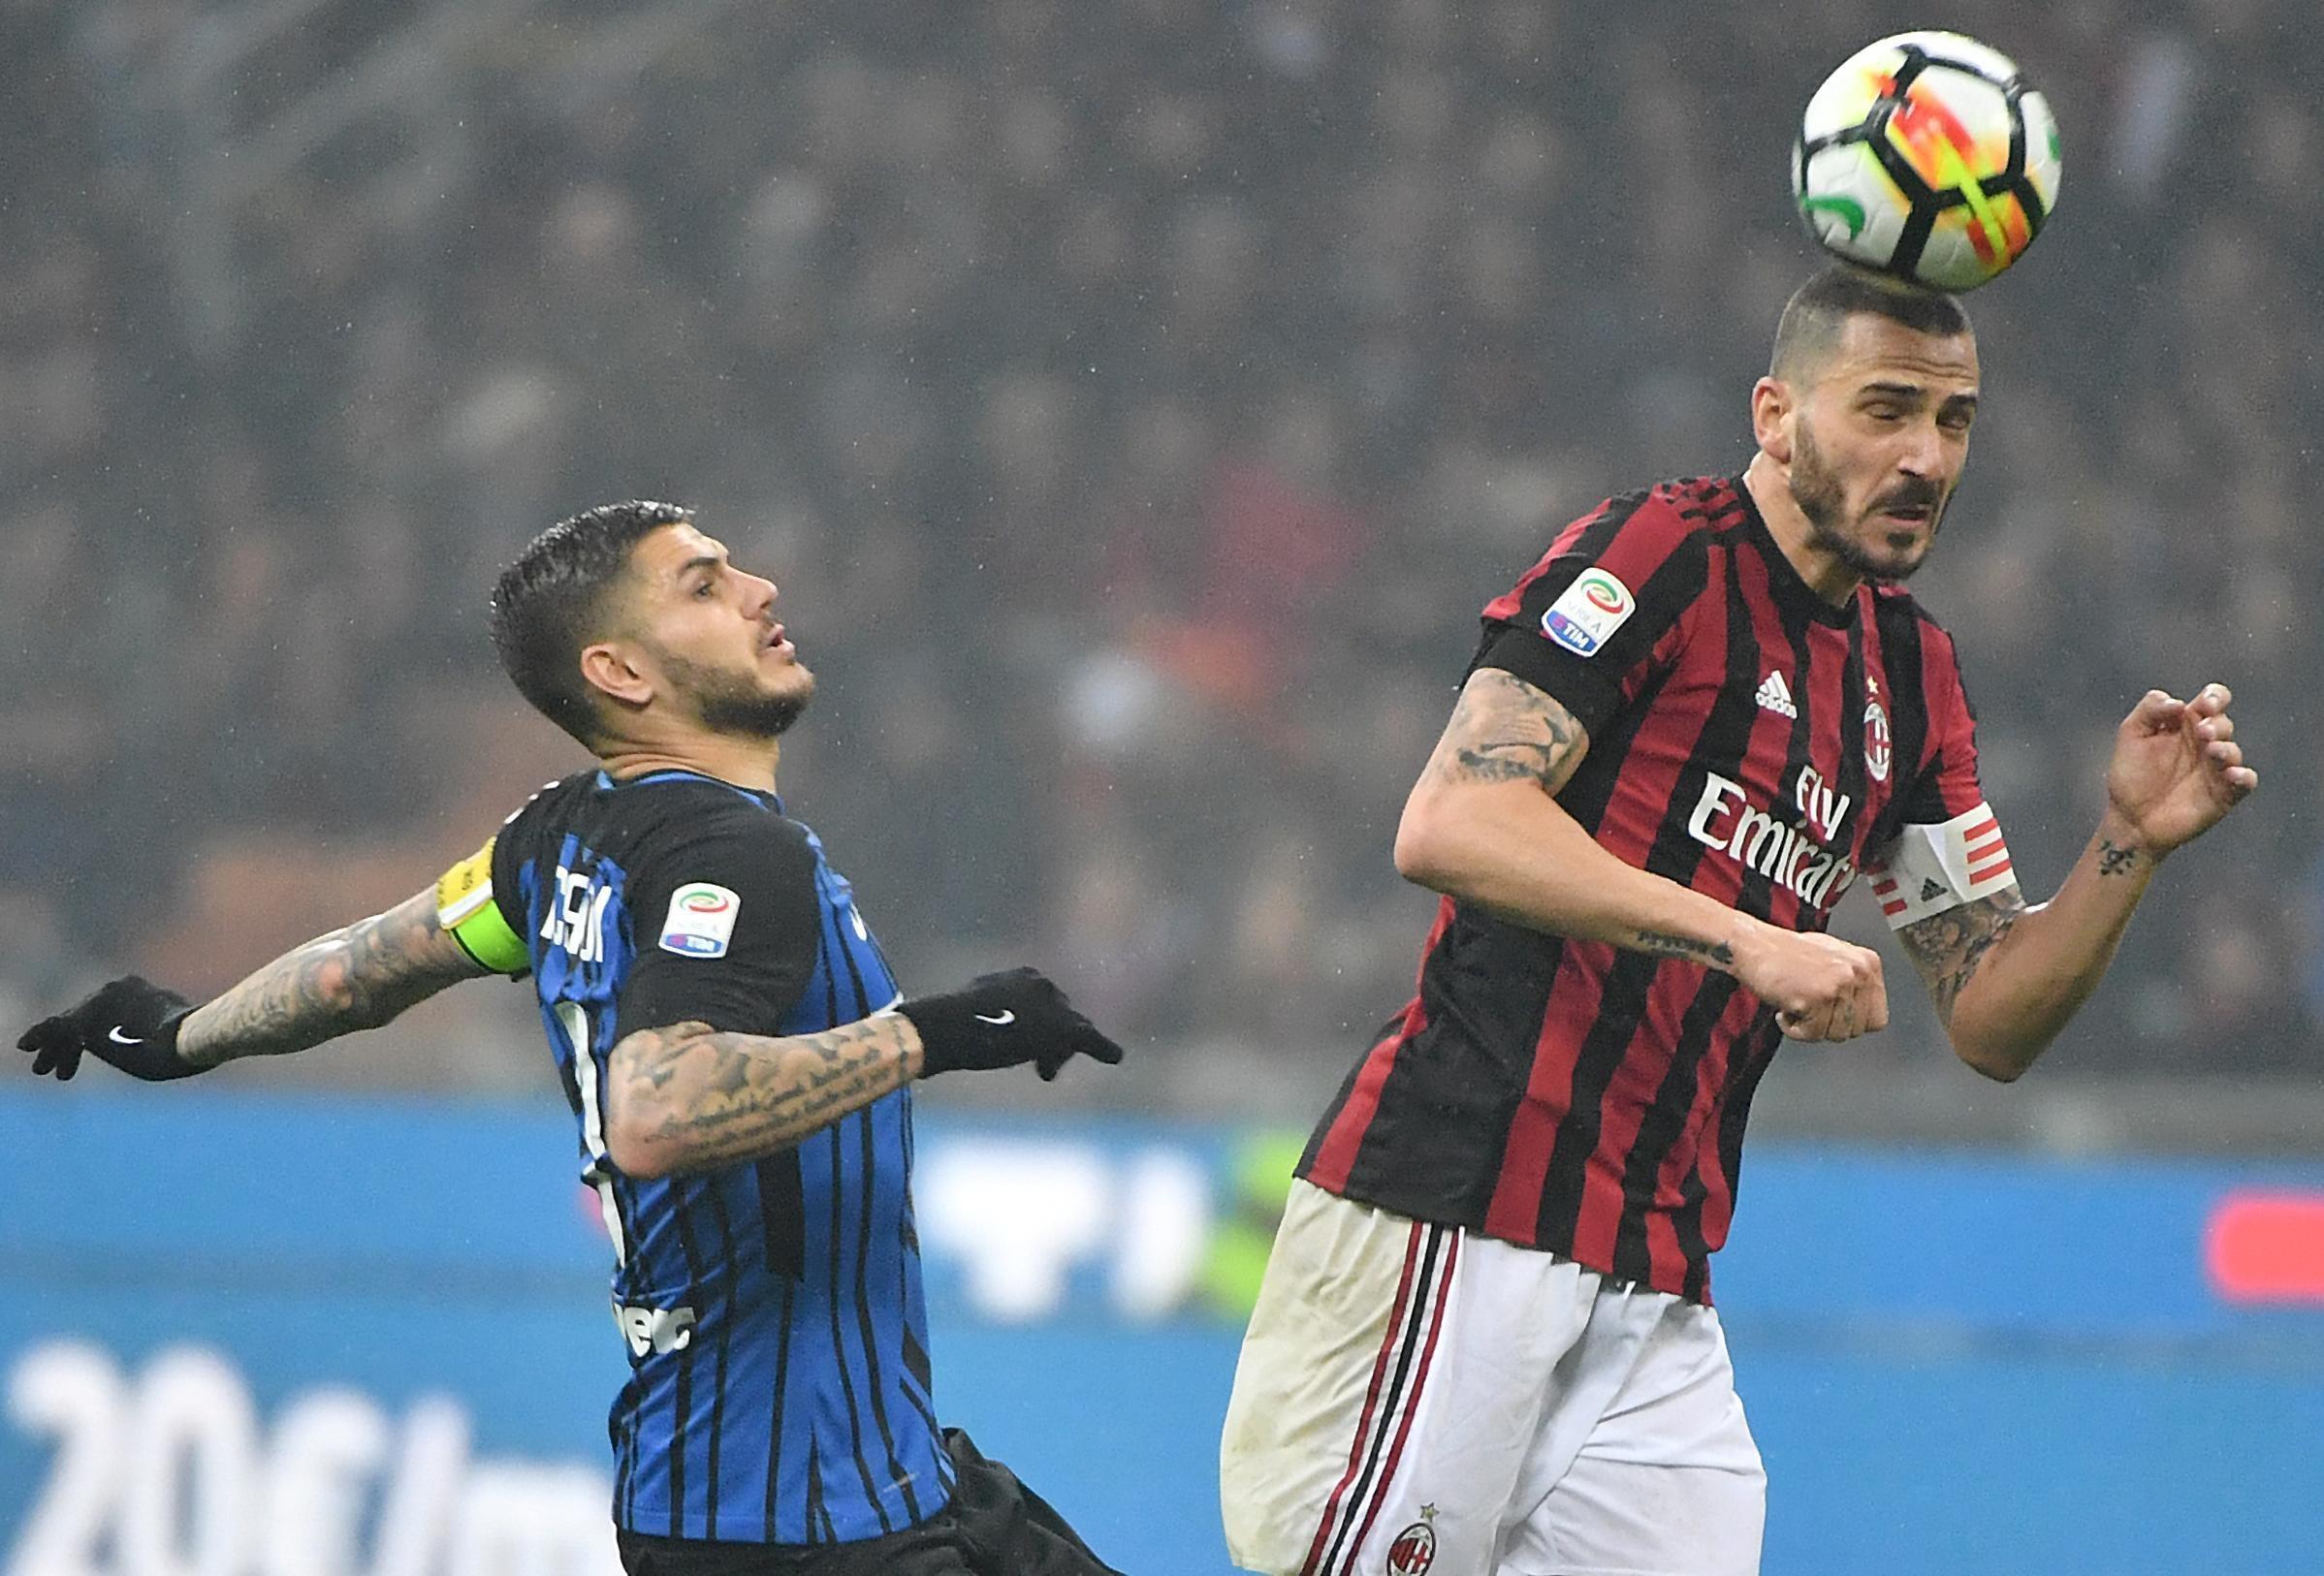 Gennaro Gattuso renova contrato com o AC Milan até 2021